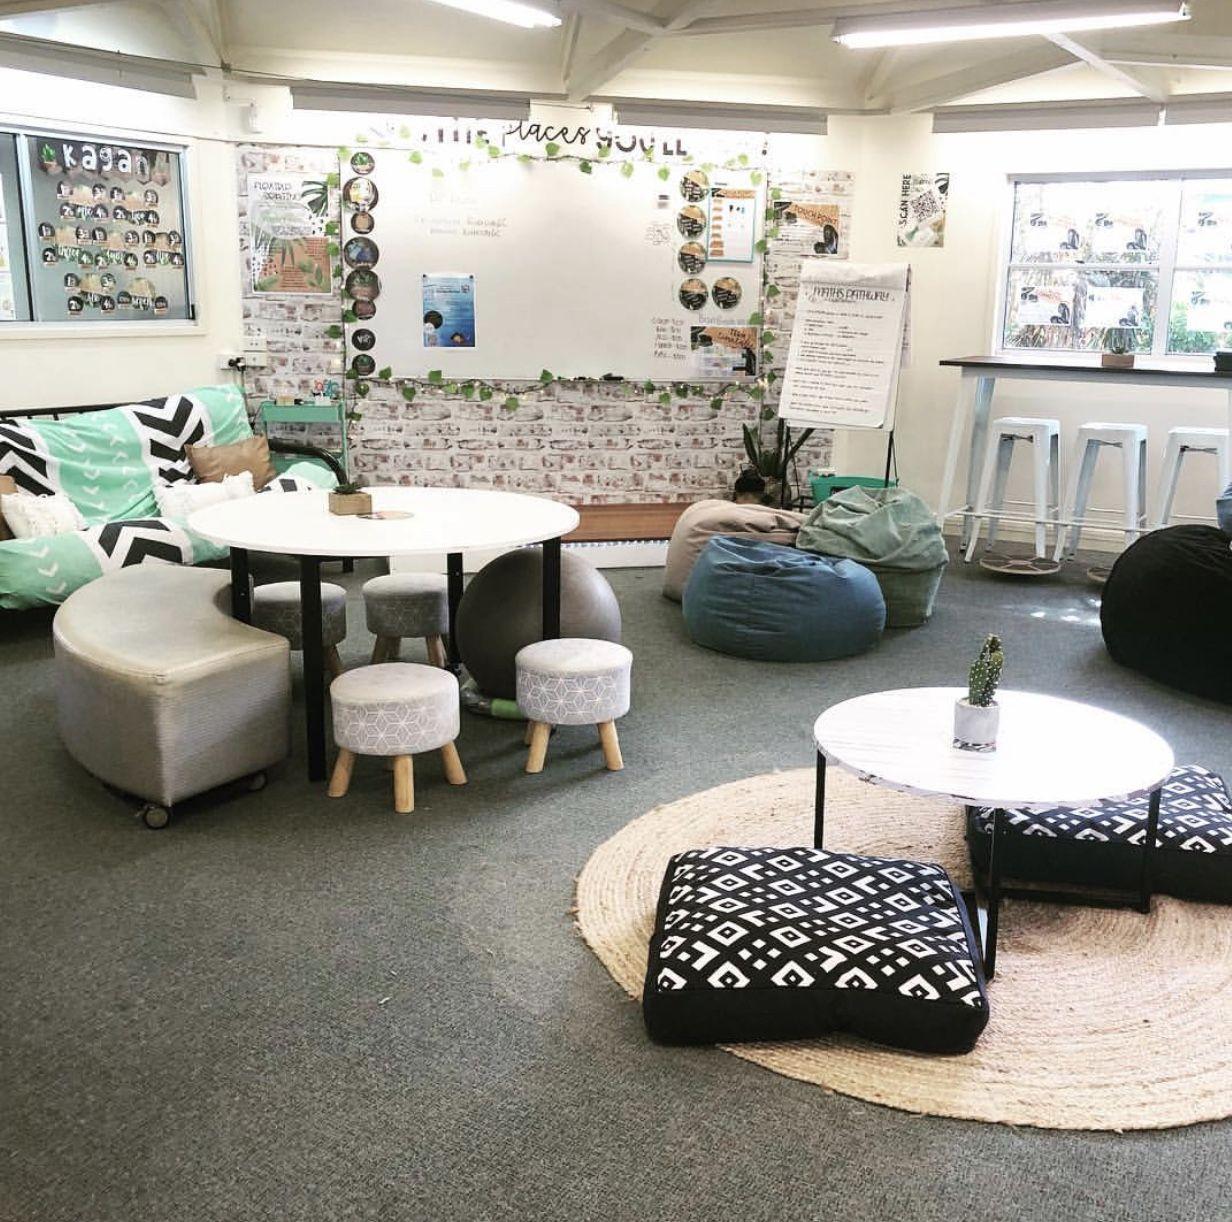 51 Best Classroom Decoration Ideas #classroomdecor